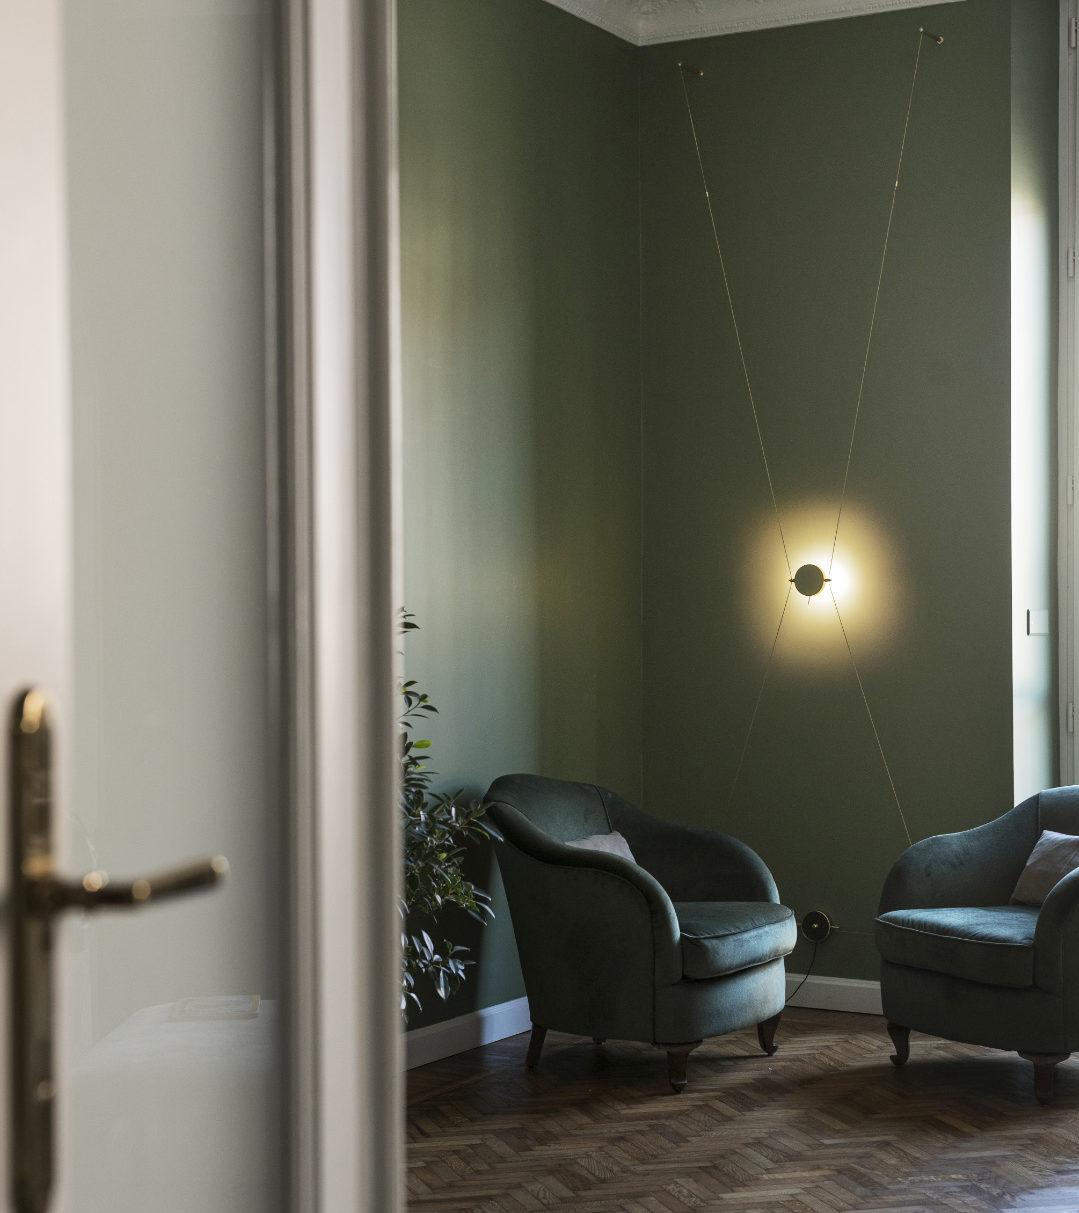 Stoccolma V living room